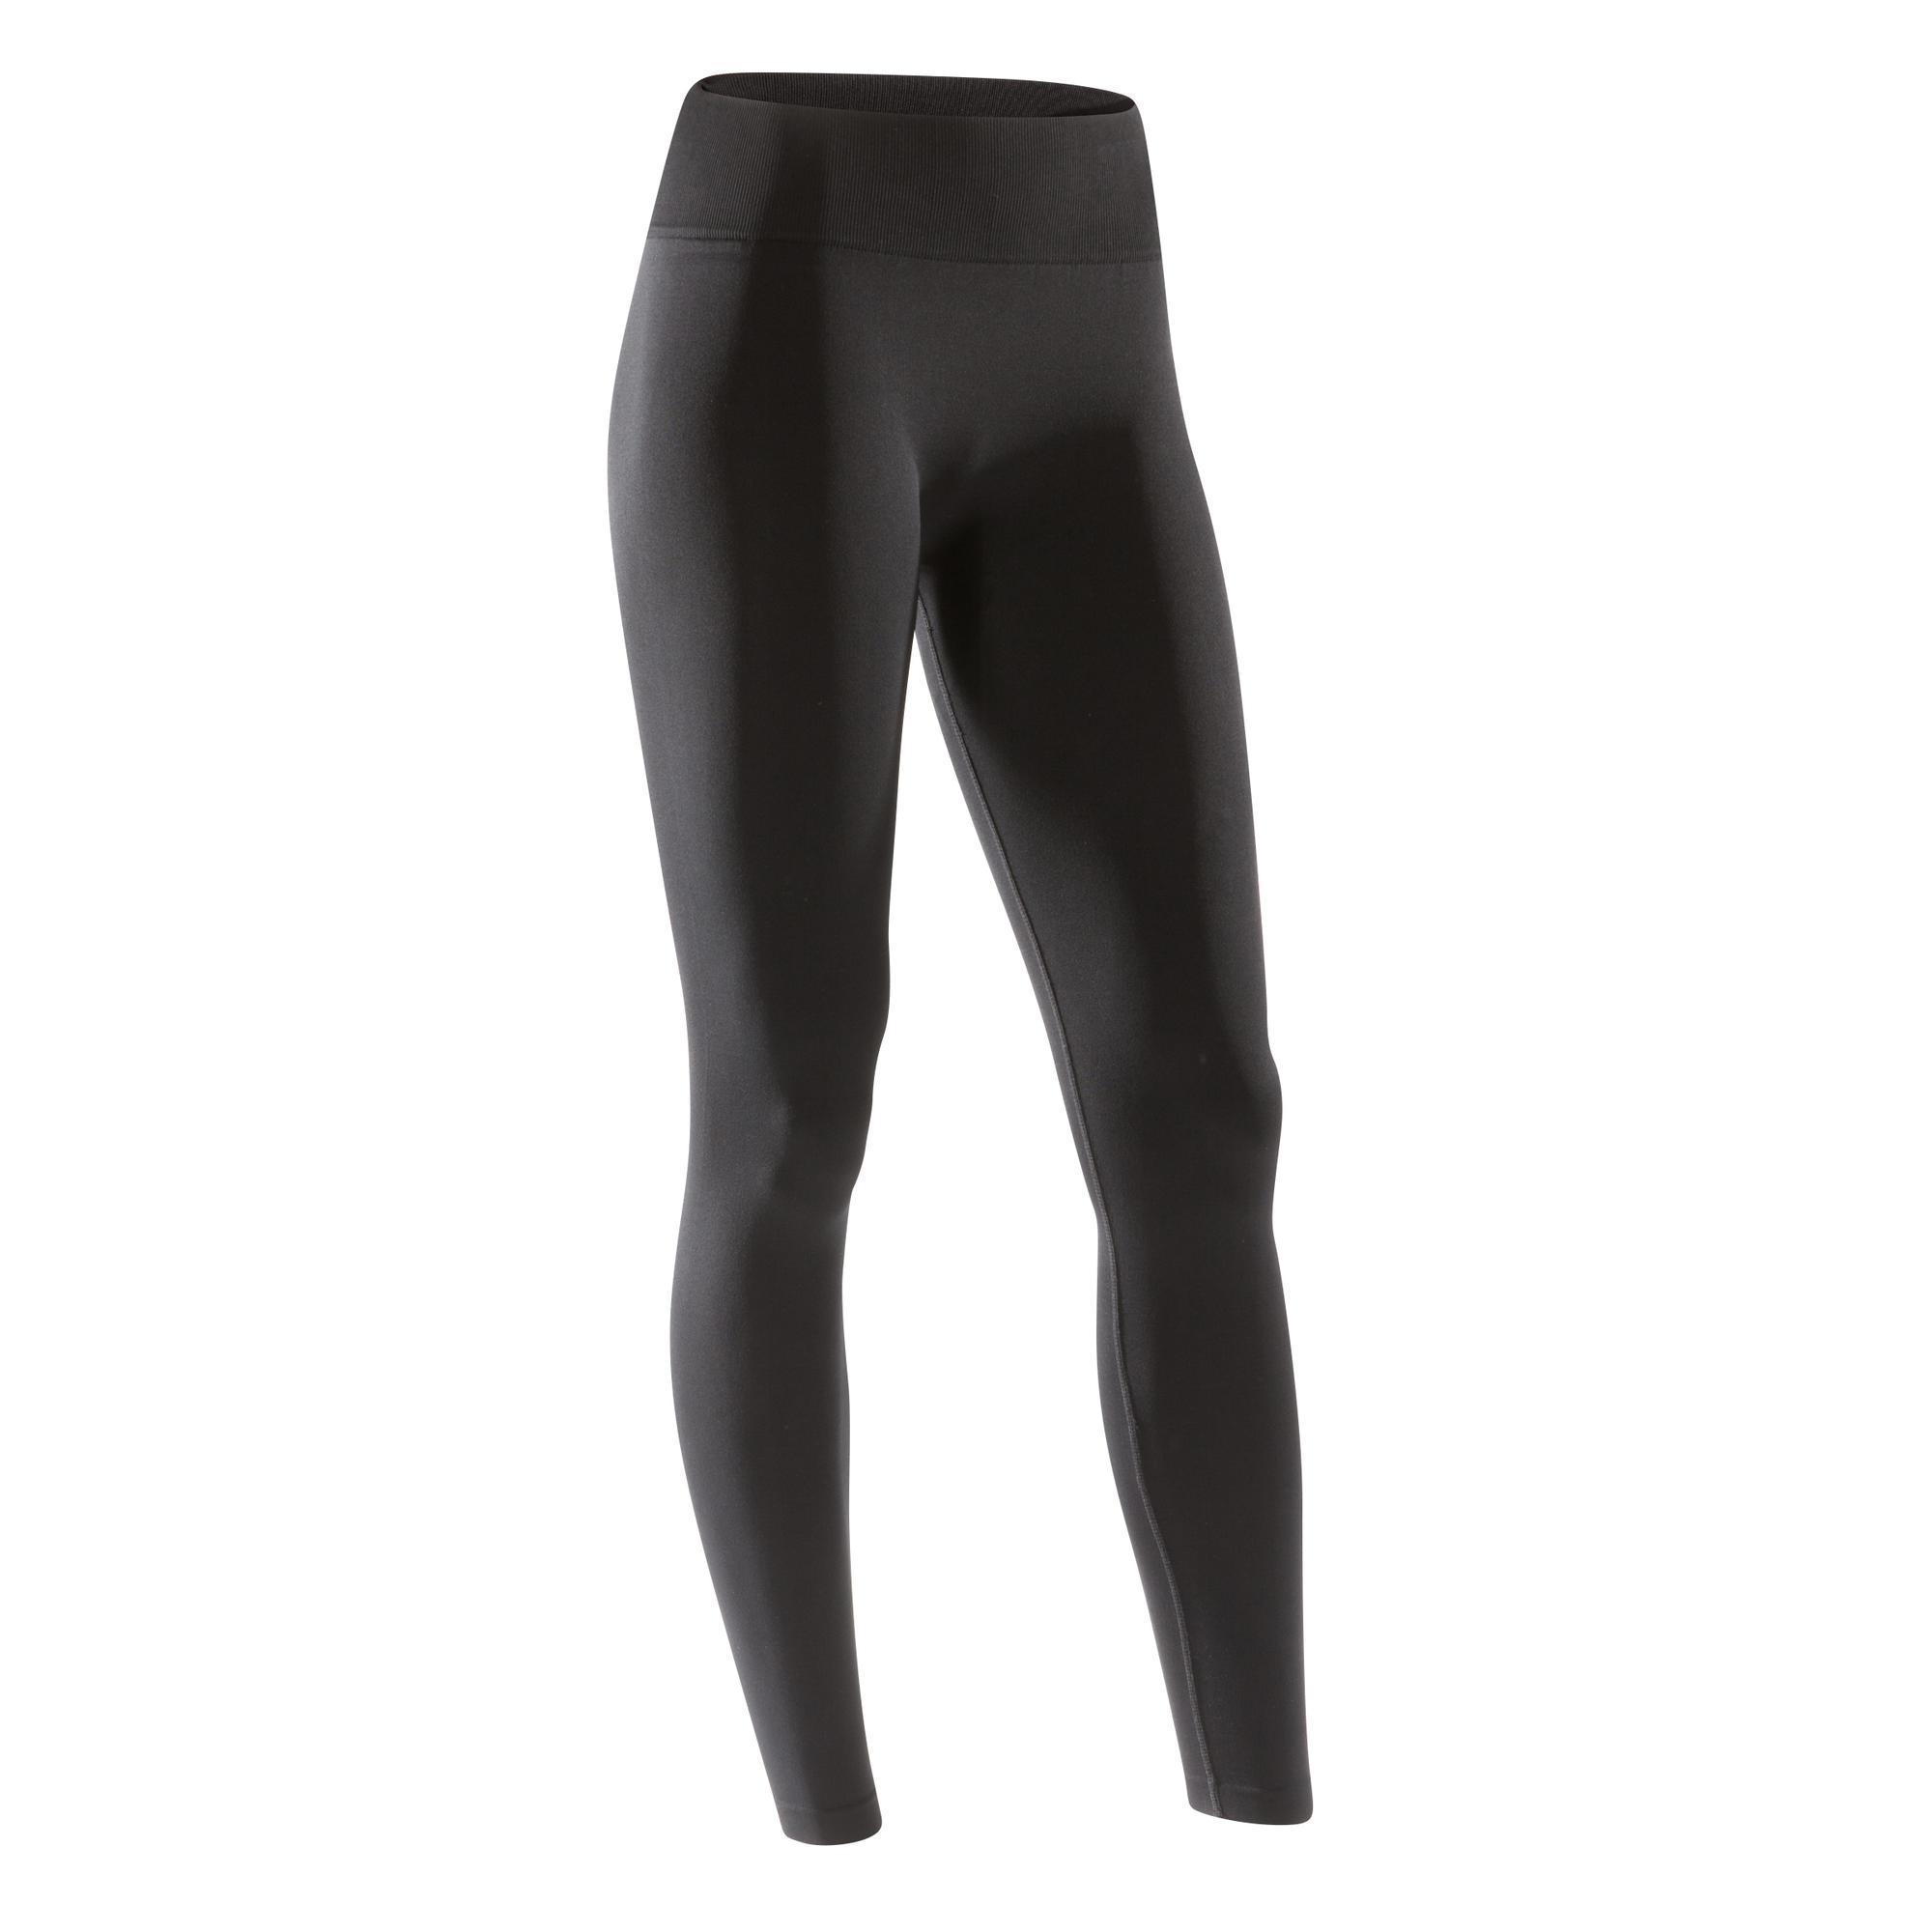 Tanz-Leggings Modern Dance nahtlos Damen schwarz | Bekleidung > Hosen > Leggings | Domyos